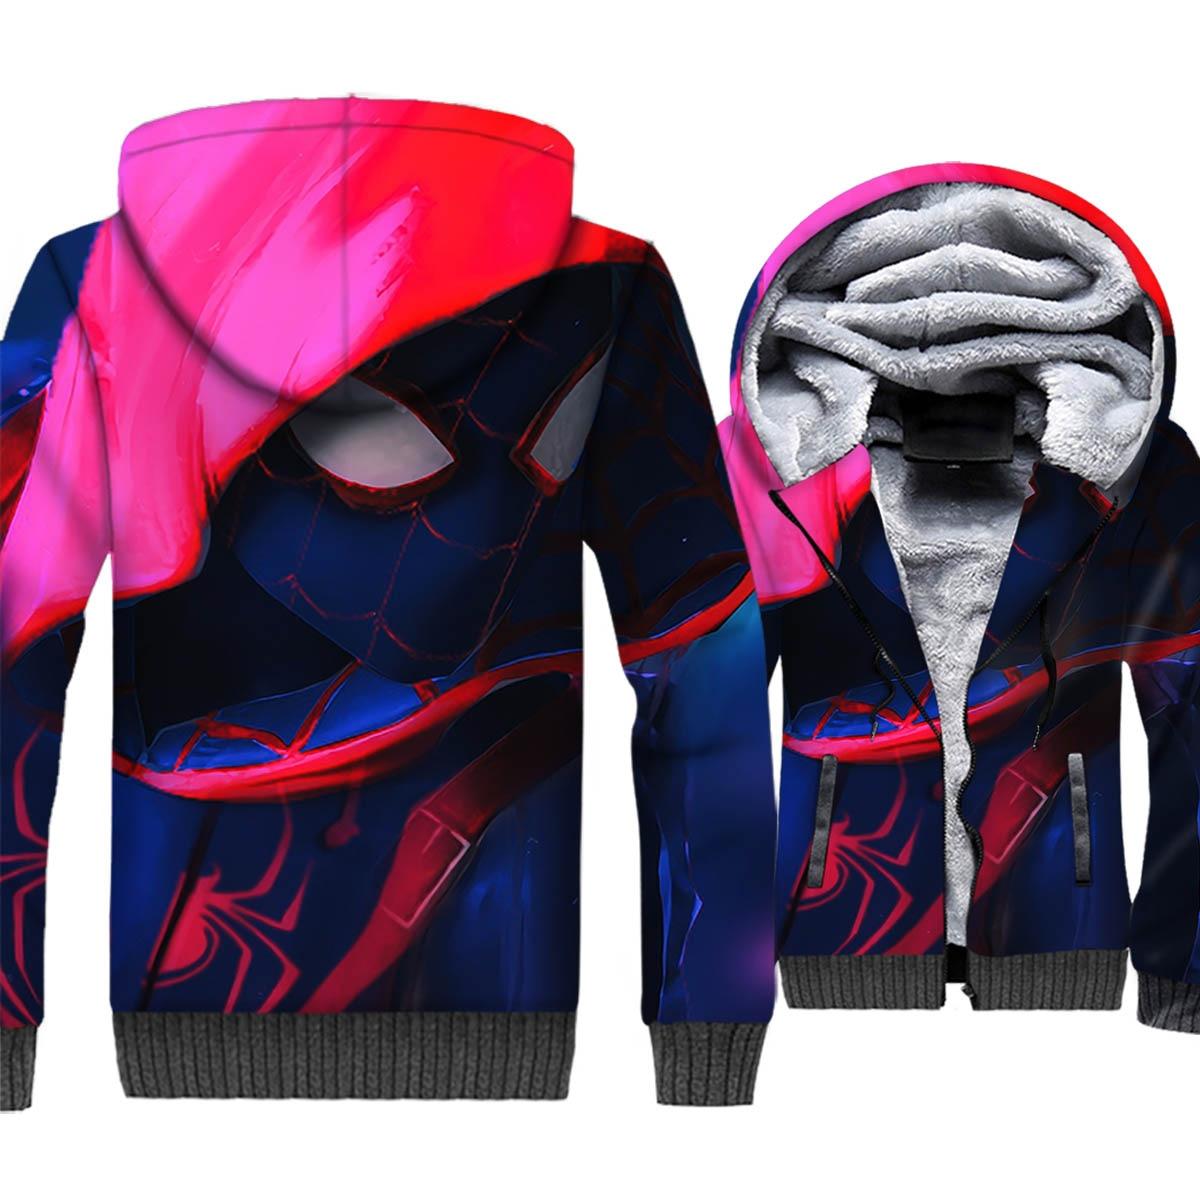 Autumn Winter Brand Clothing Streetwear Hoodies For Men 2018 Hot Thick Coats Spiderman Super Hero 3D Sweatshirt Harajuku Hoodie